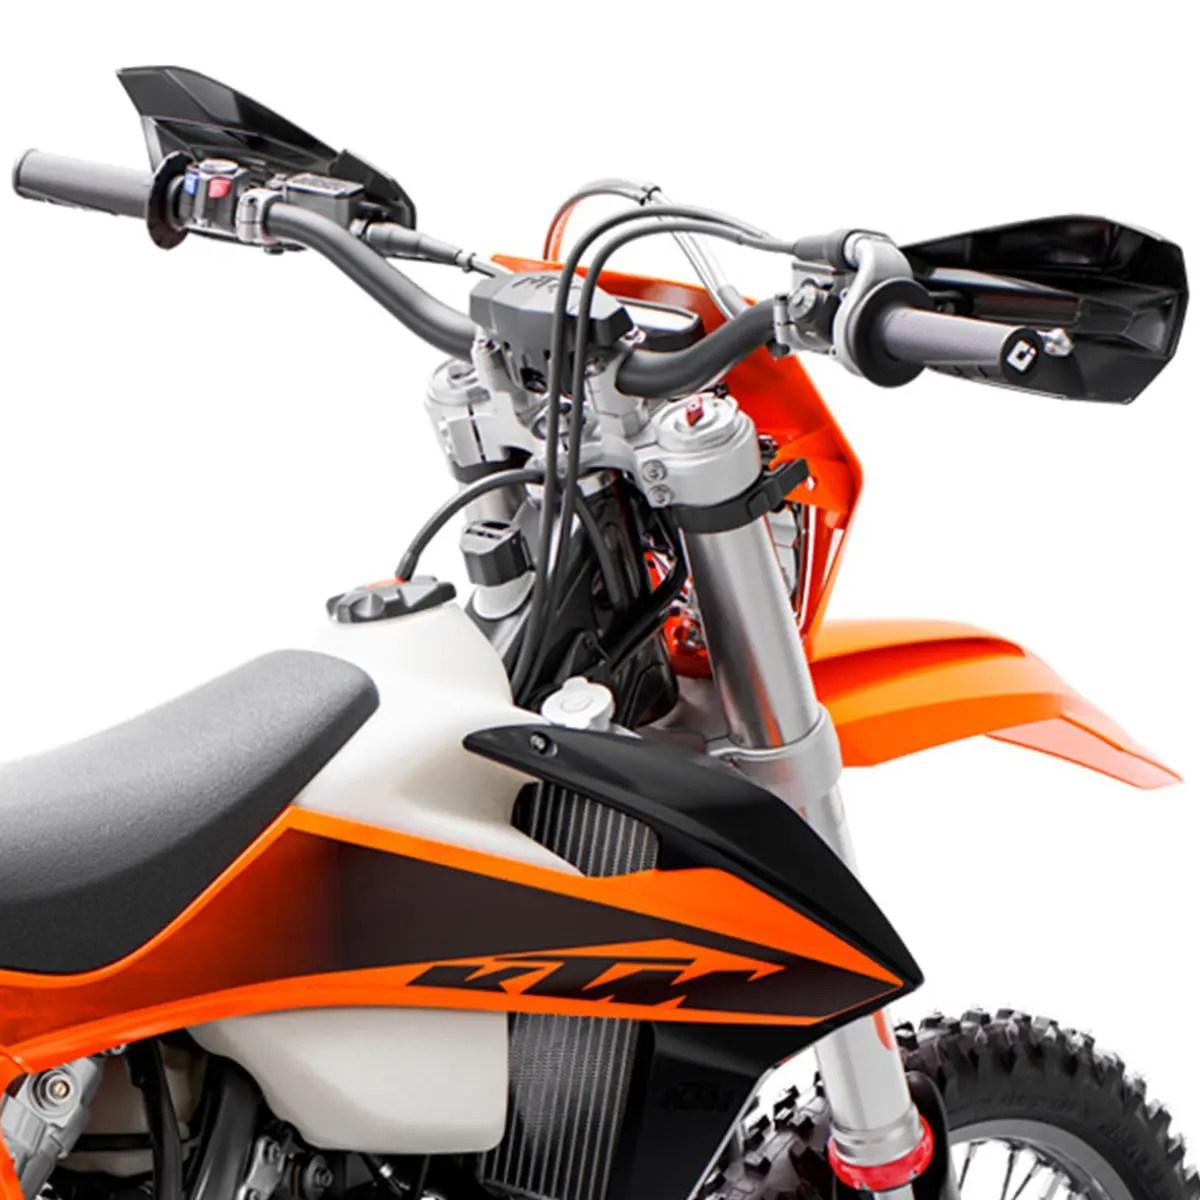 GUIDON-KTM-150-EXC-TPI-2020